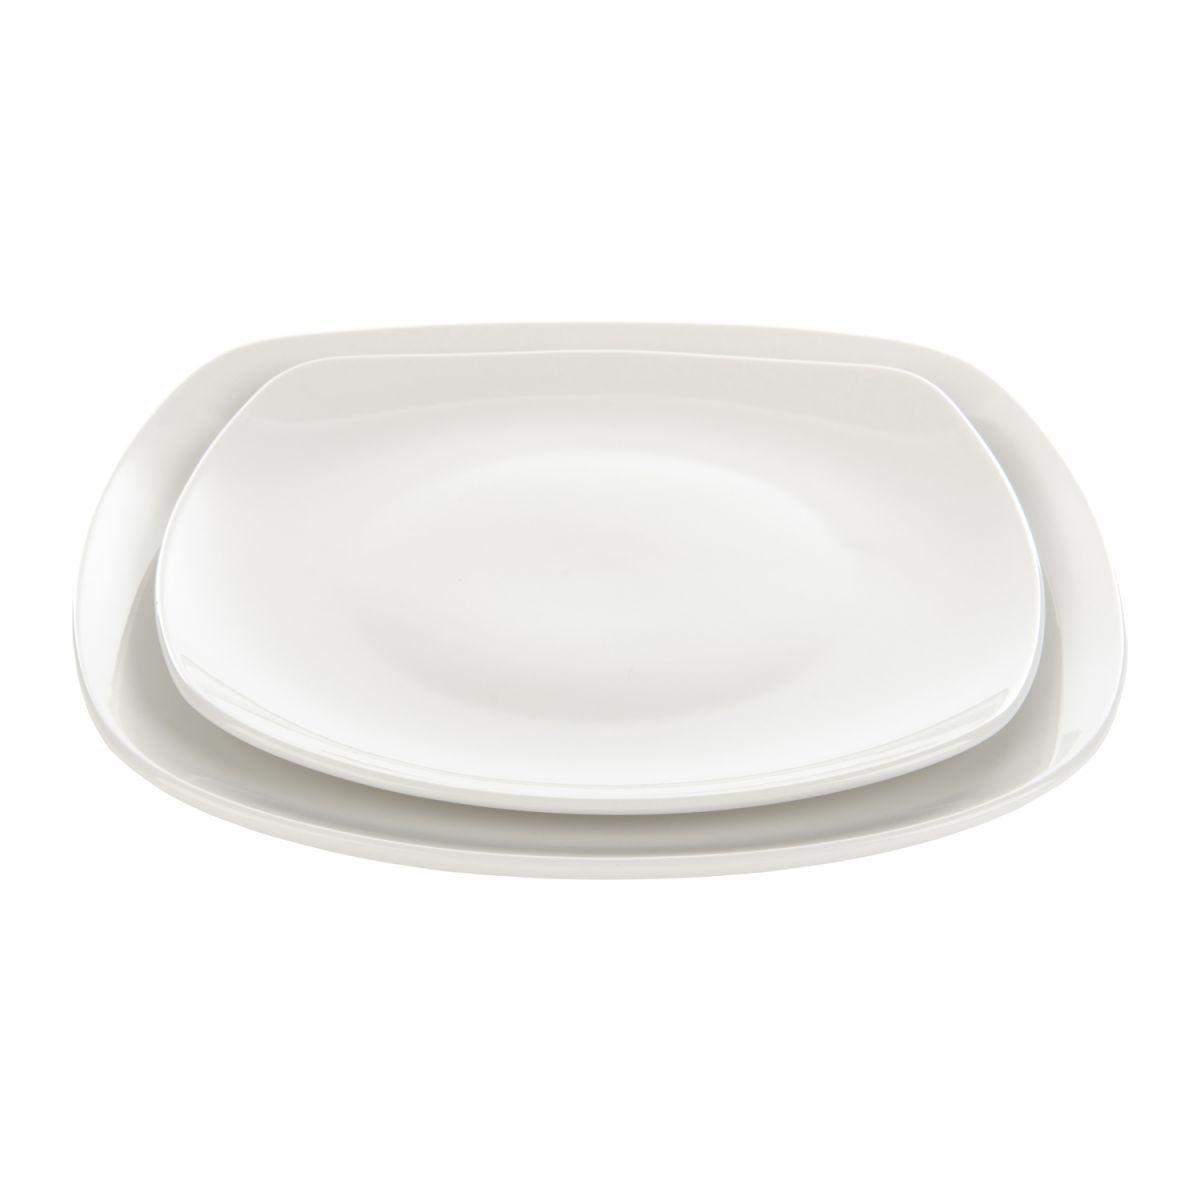 bord porselein vierkant afgeronde hoeken wit 25x25x25cm box6